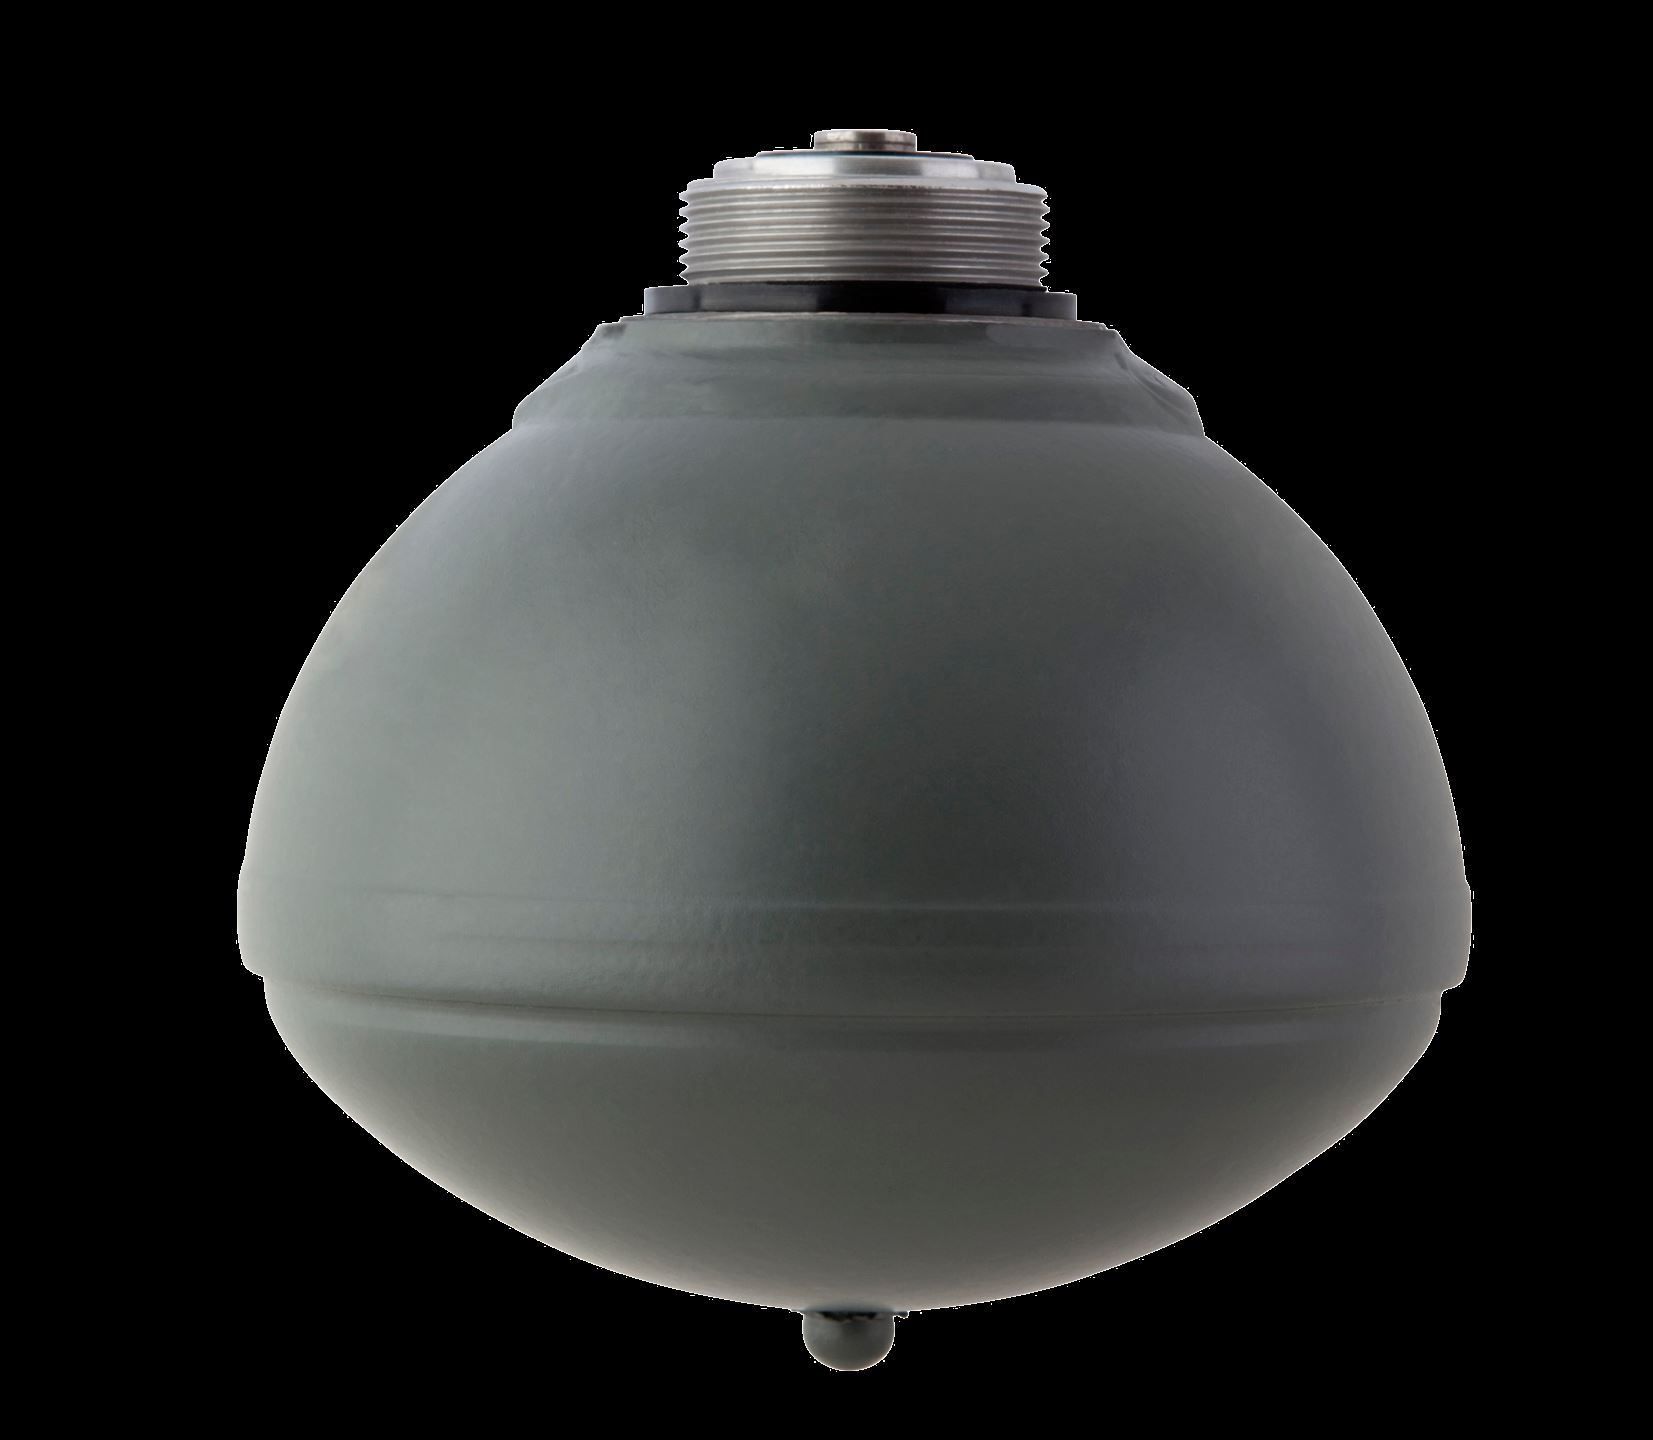 suplex 75071 rear suspension sphere for citroen xantia ebay. Black Bedroom Furniture Sets. Home Design Ideas